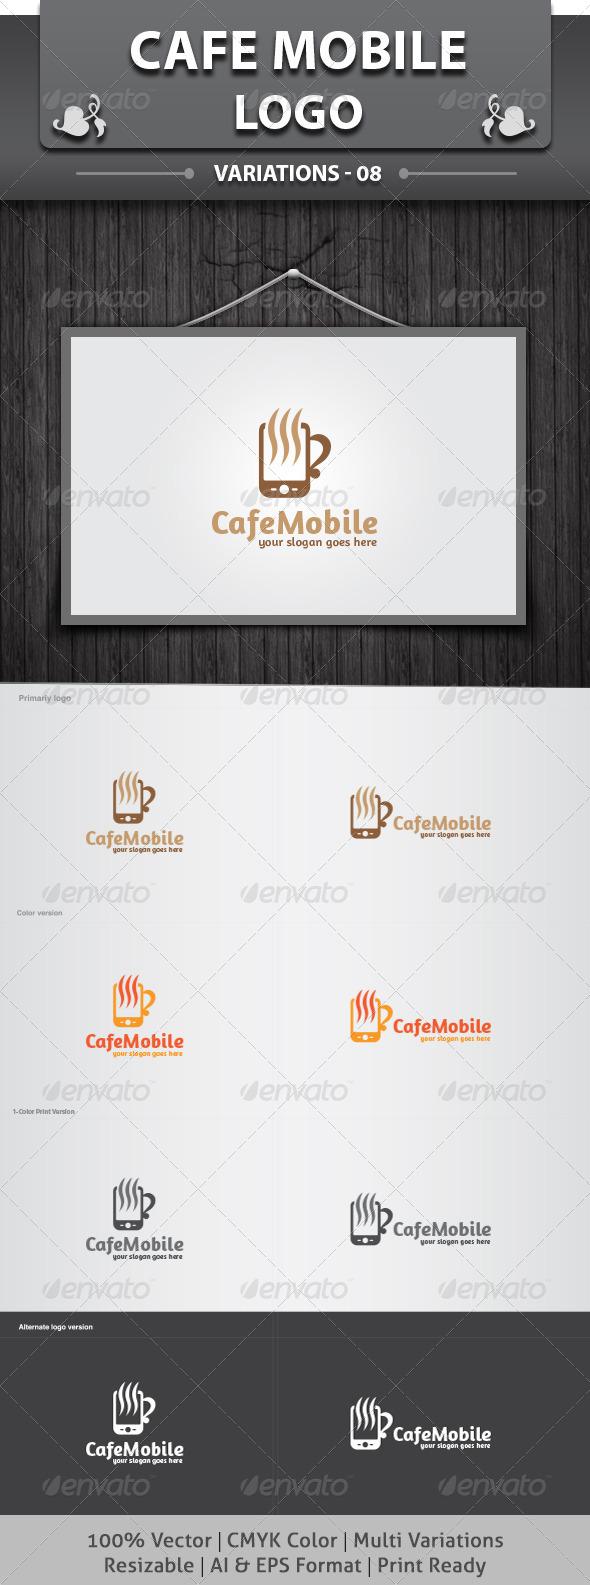 Cafe Mobile Logo